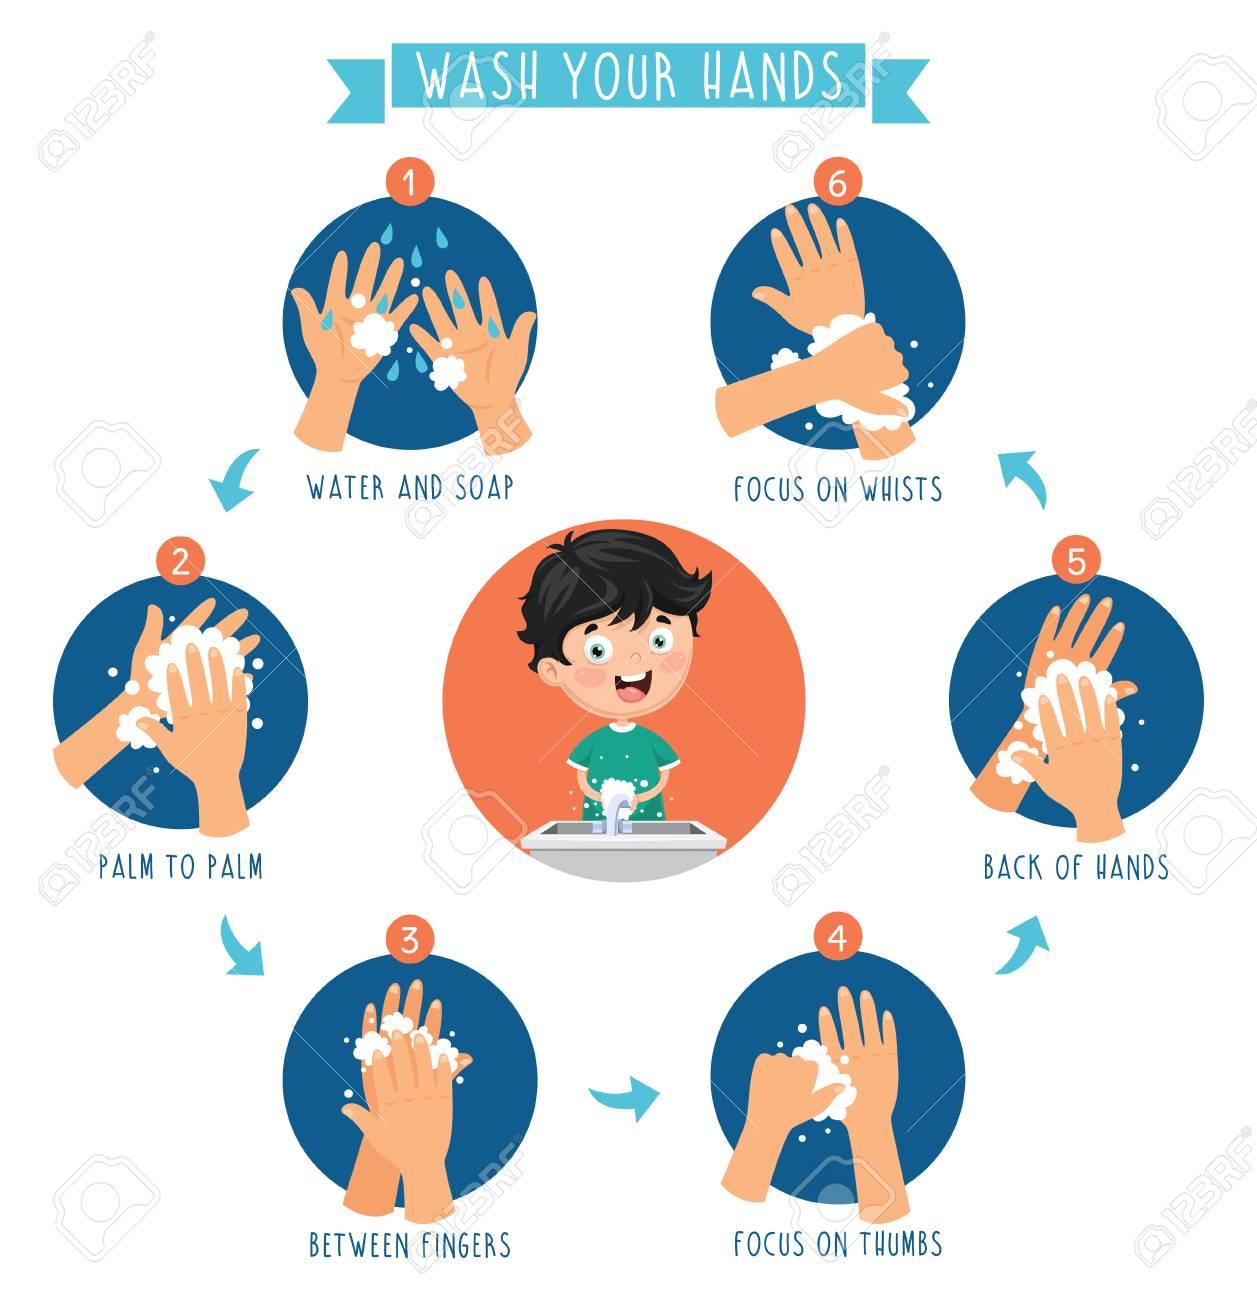 Vector Illustration Of Washing Hands - 104078052